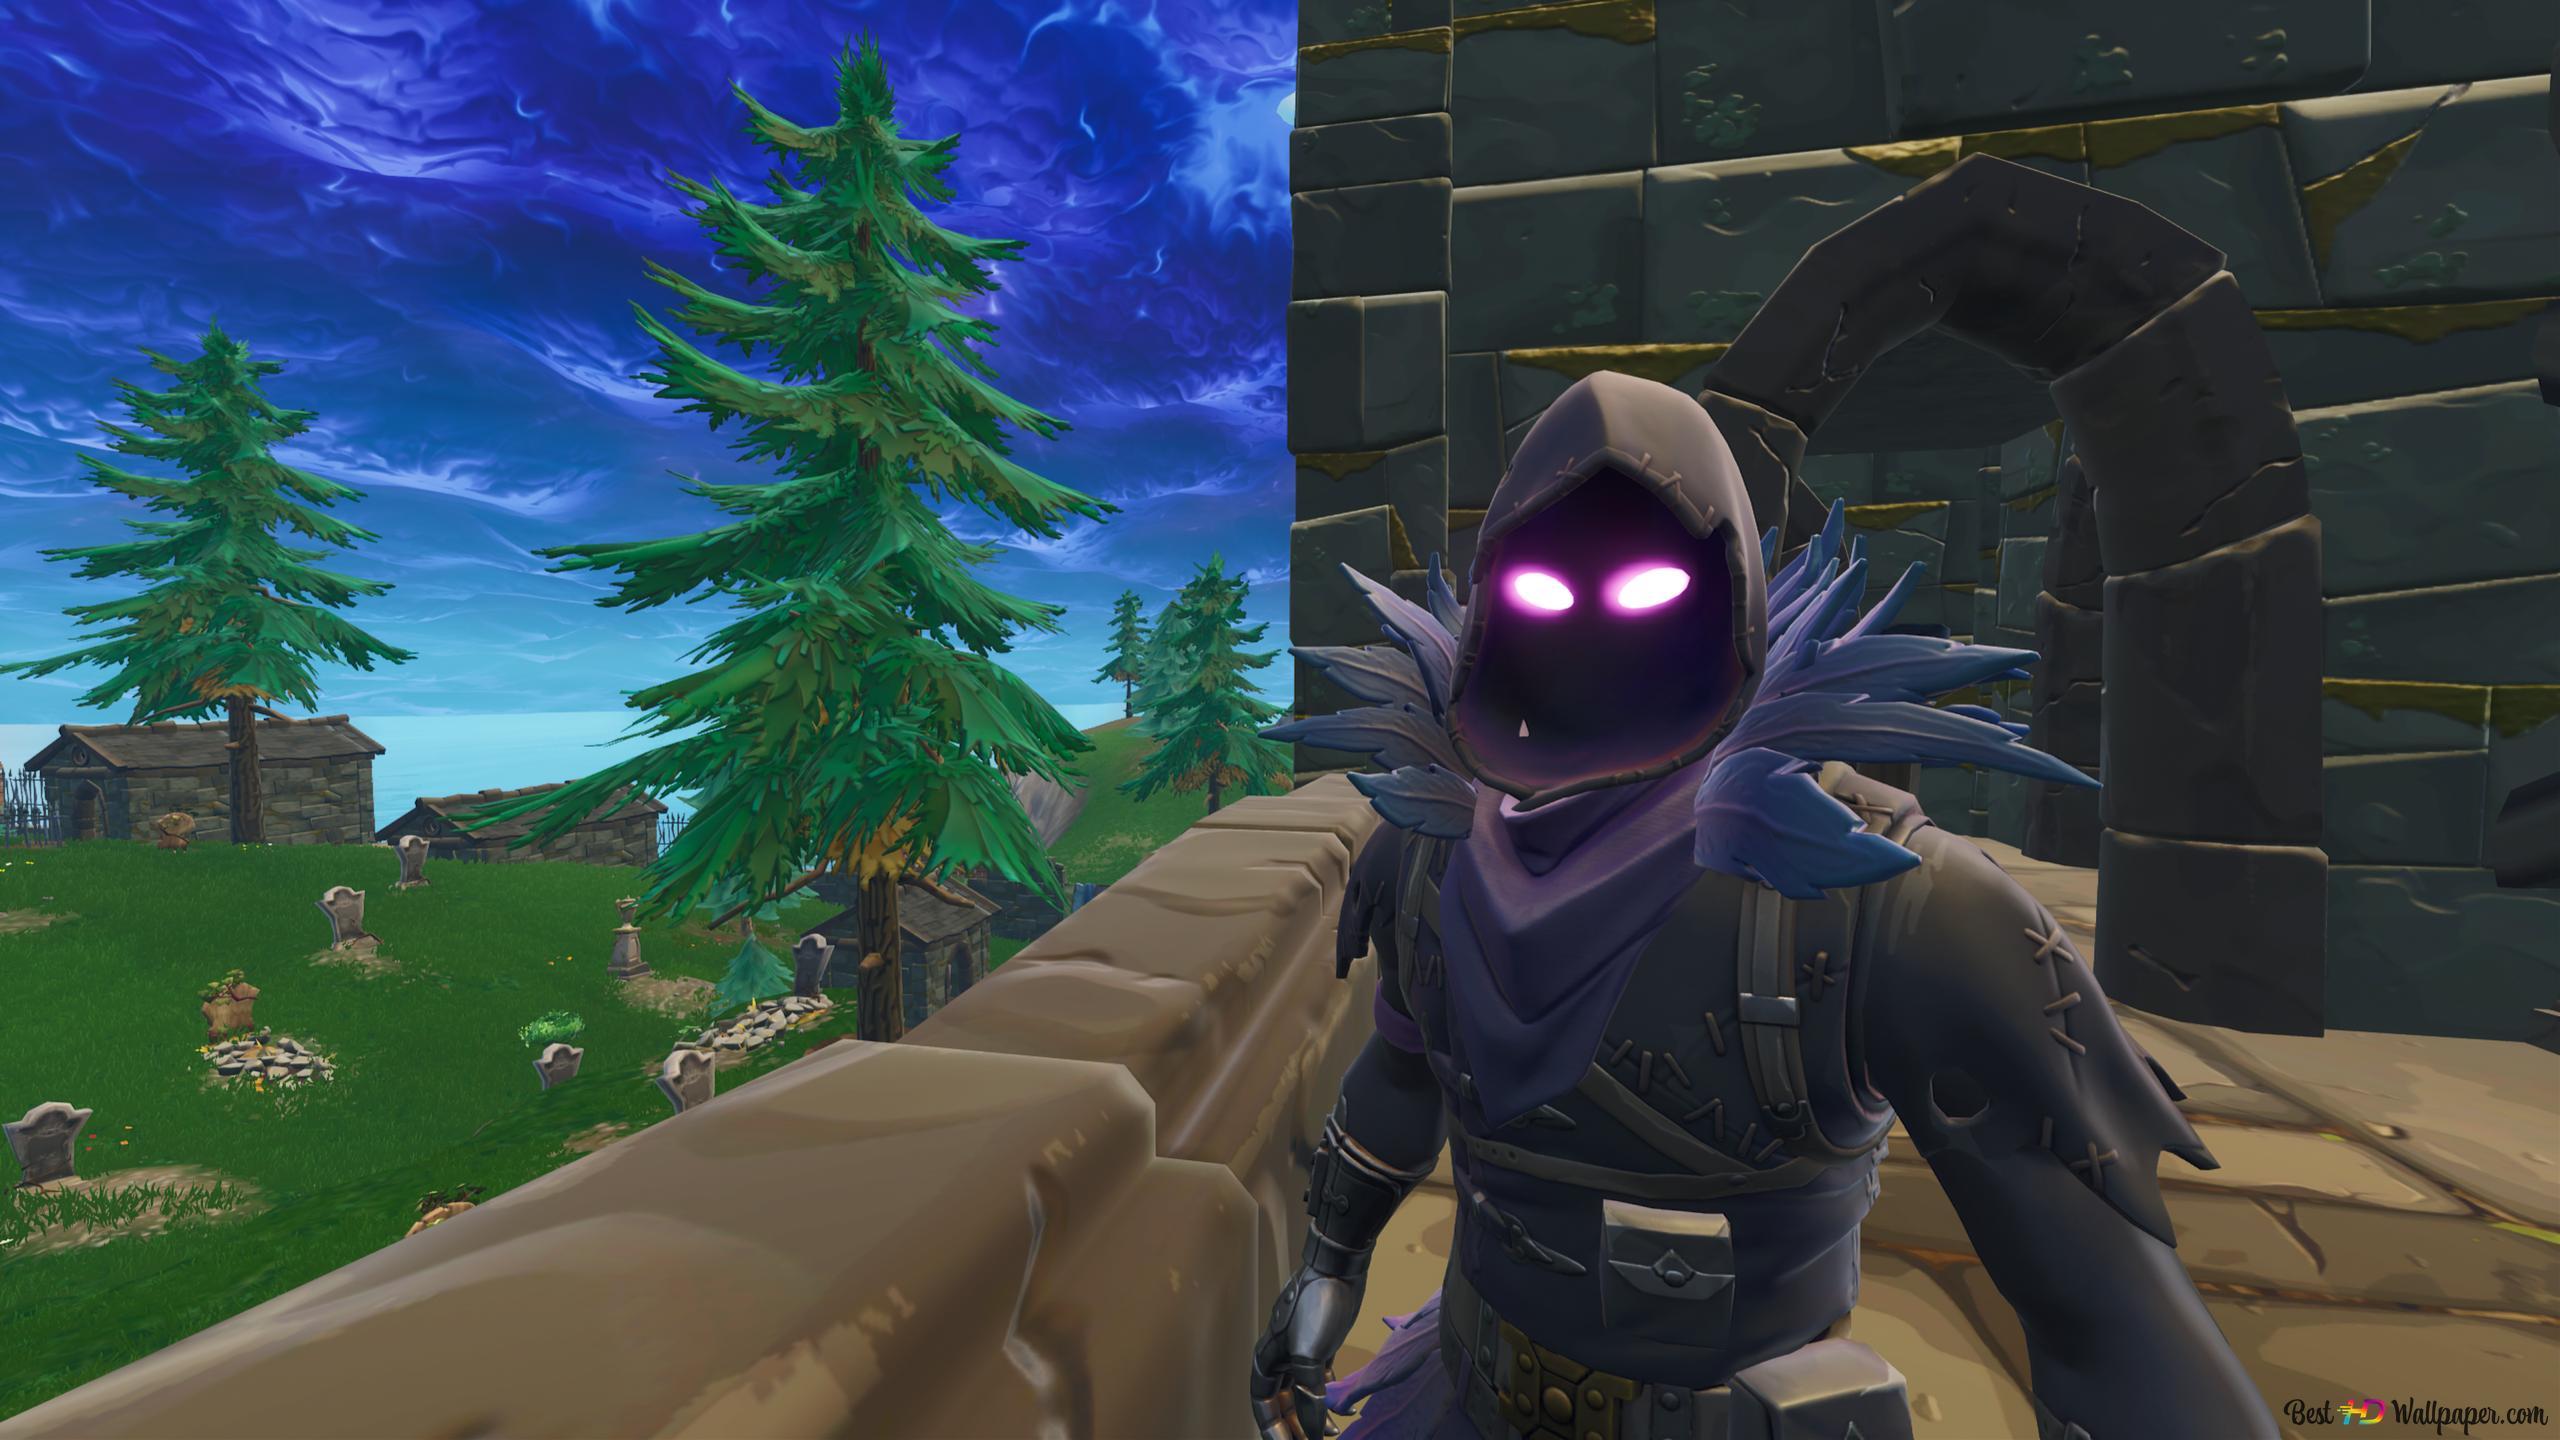 Raven Fortnite Battle Royale Hd Wallpaper Download